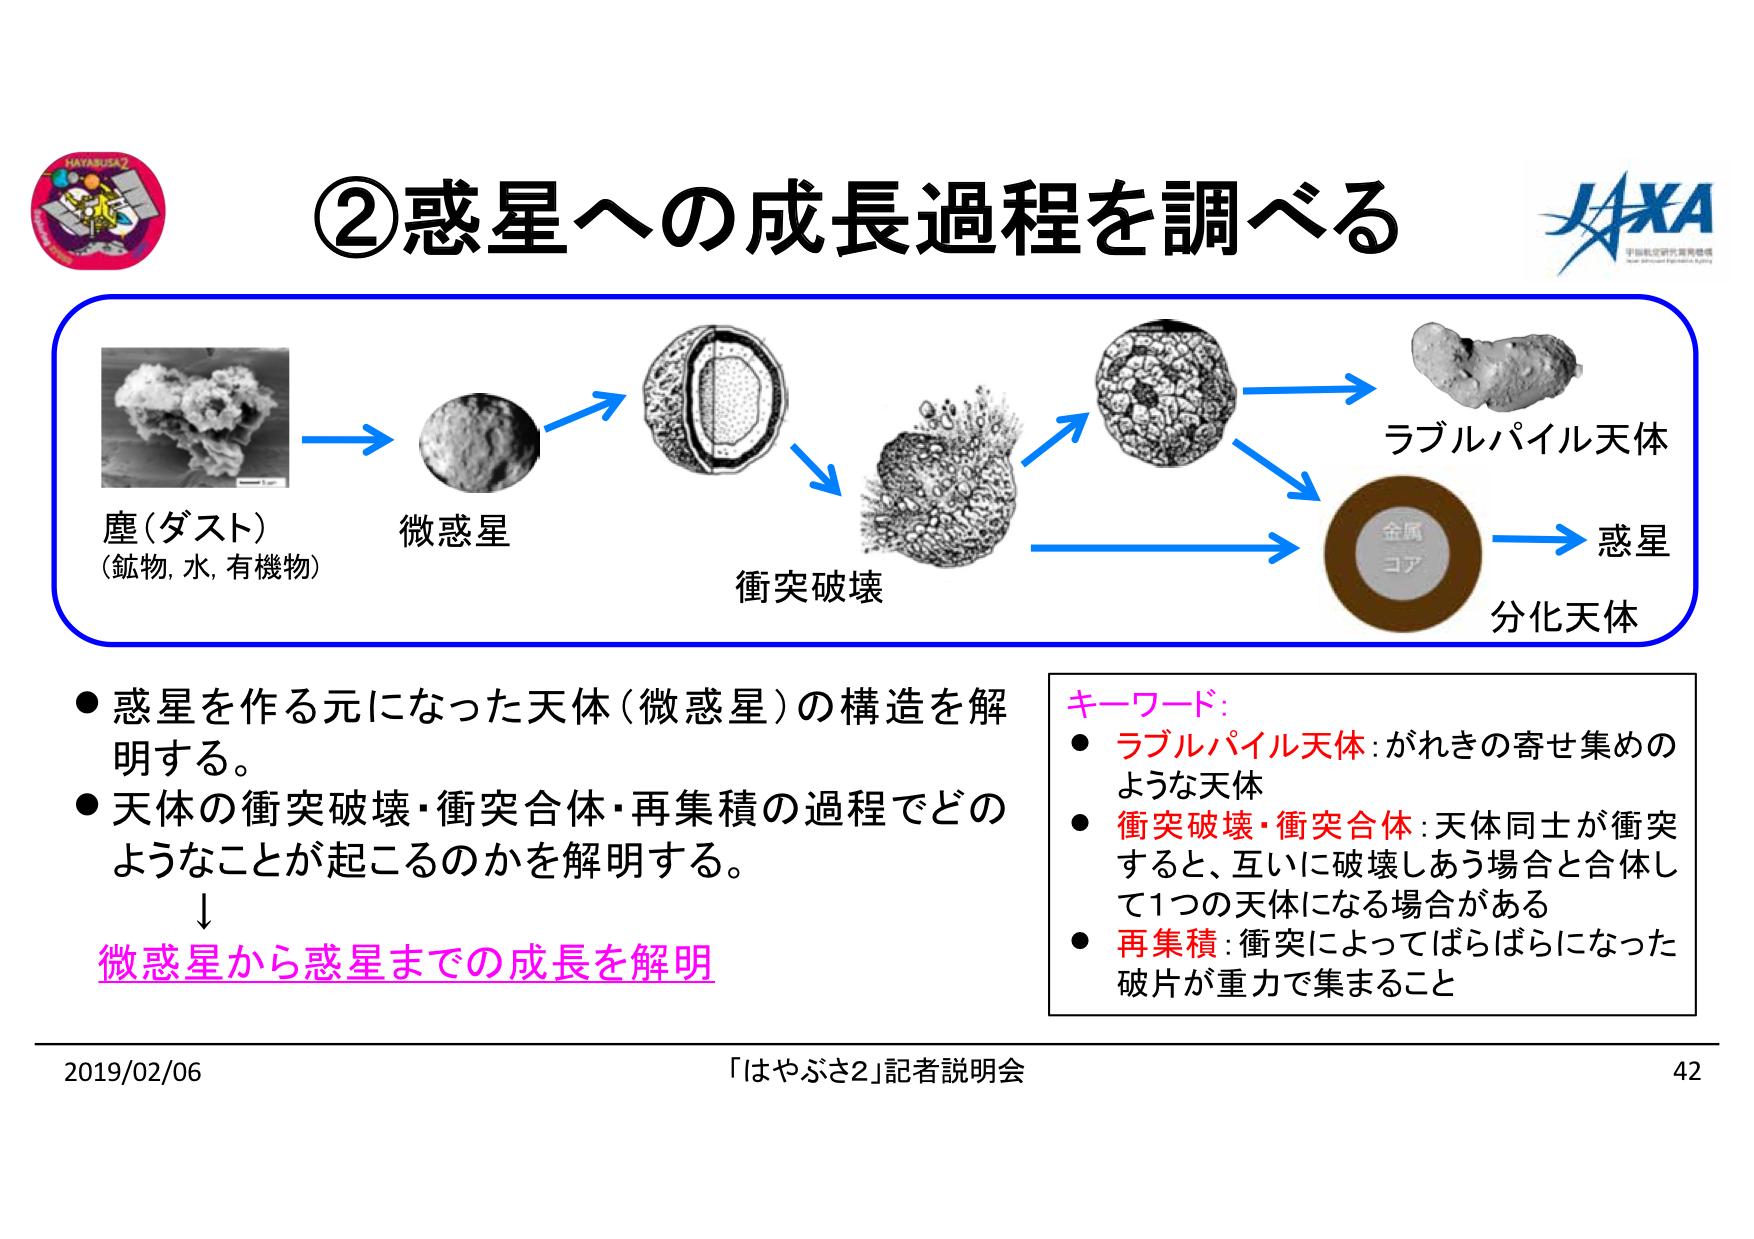 f:id:Imamura:20190204175536p:plain